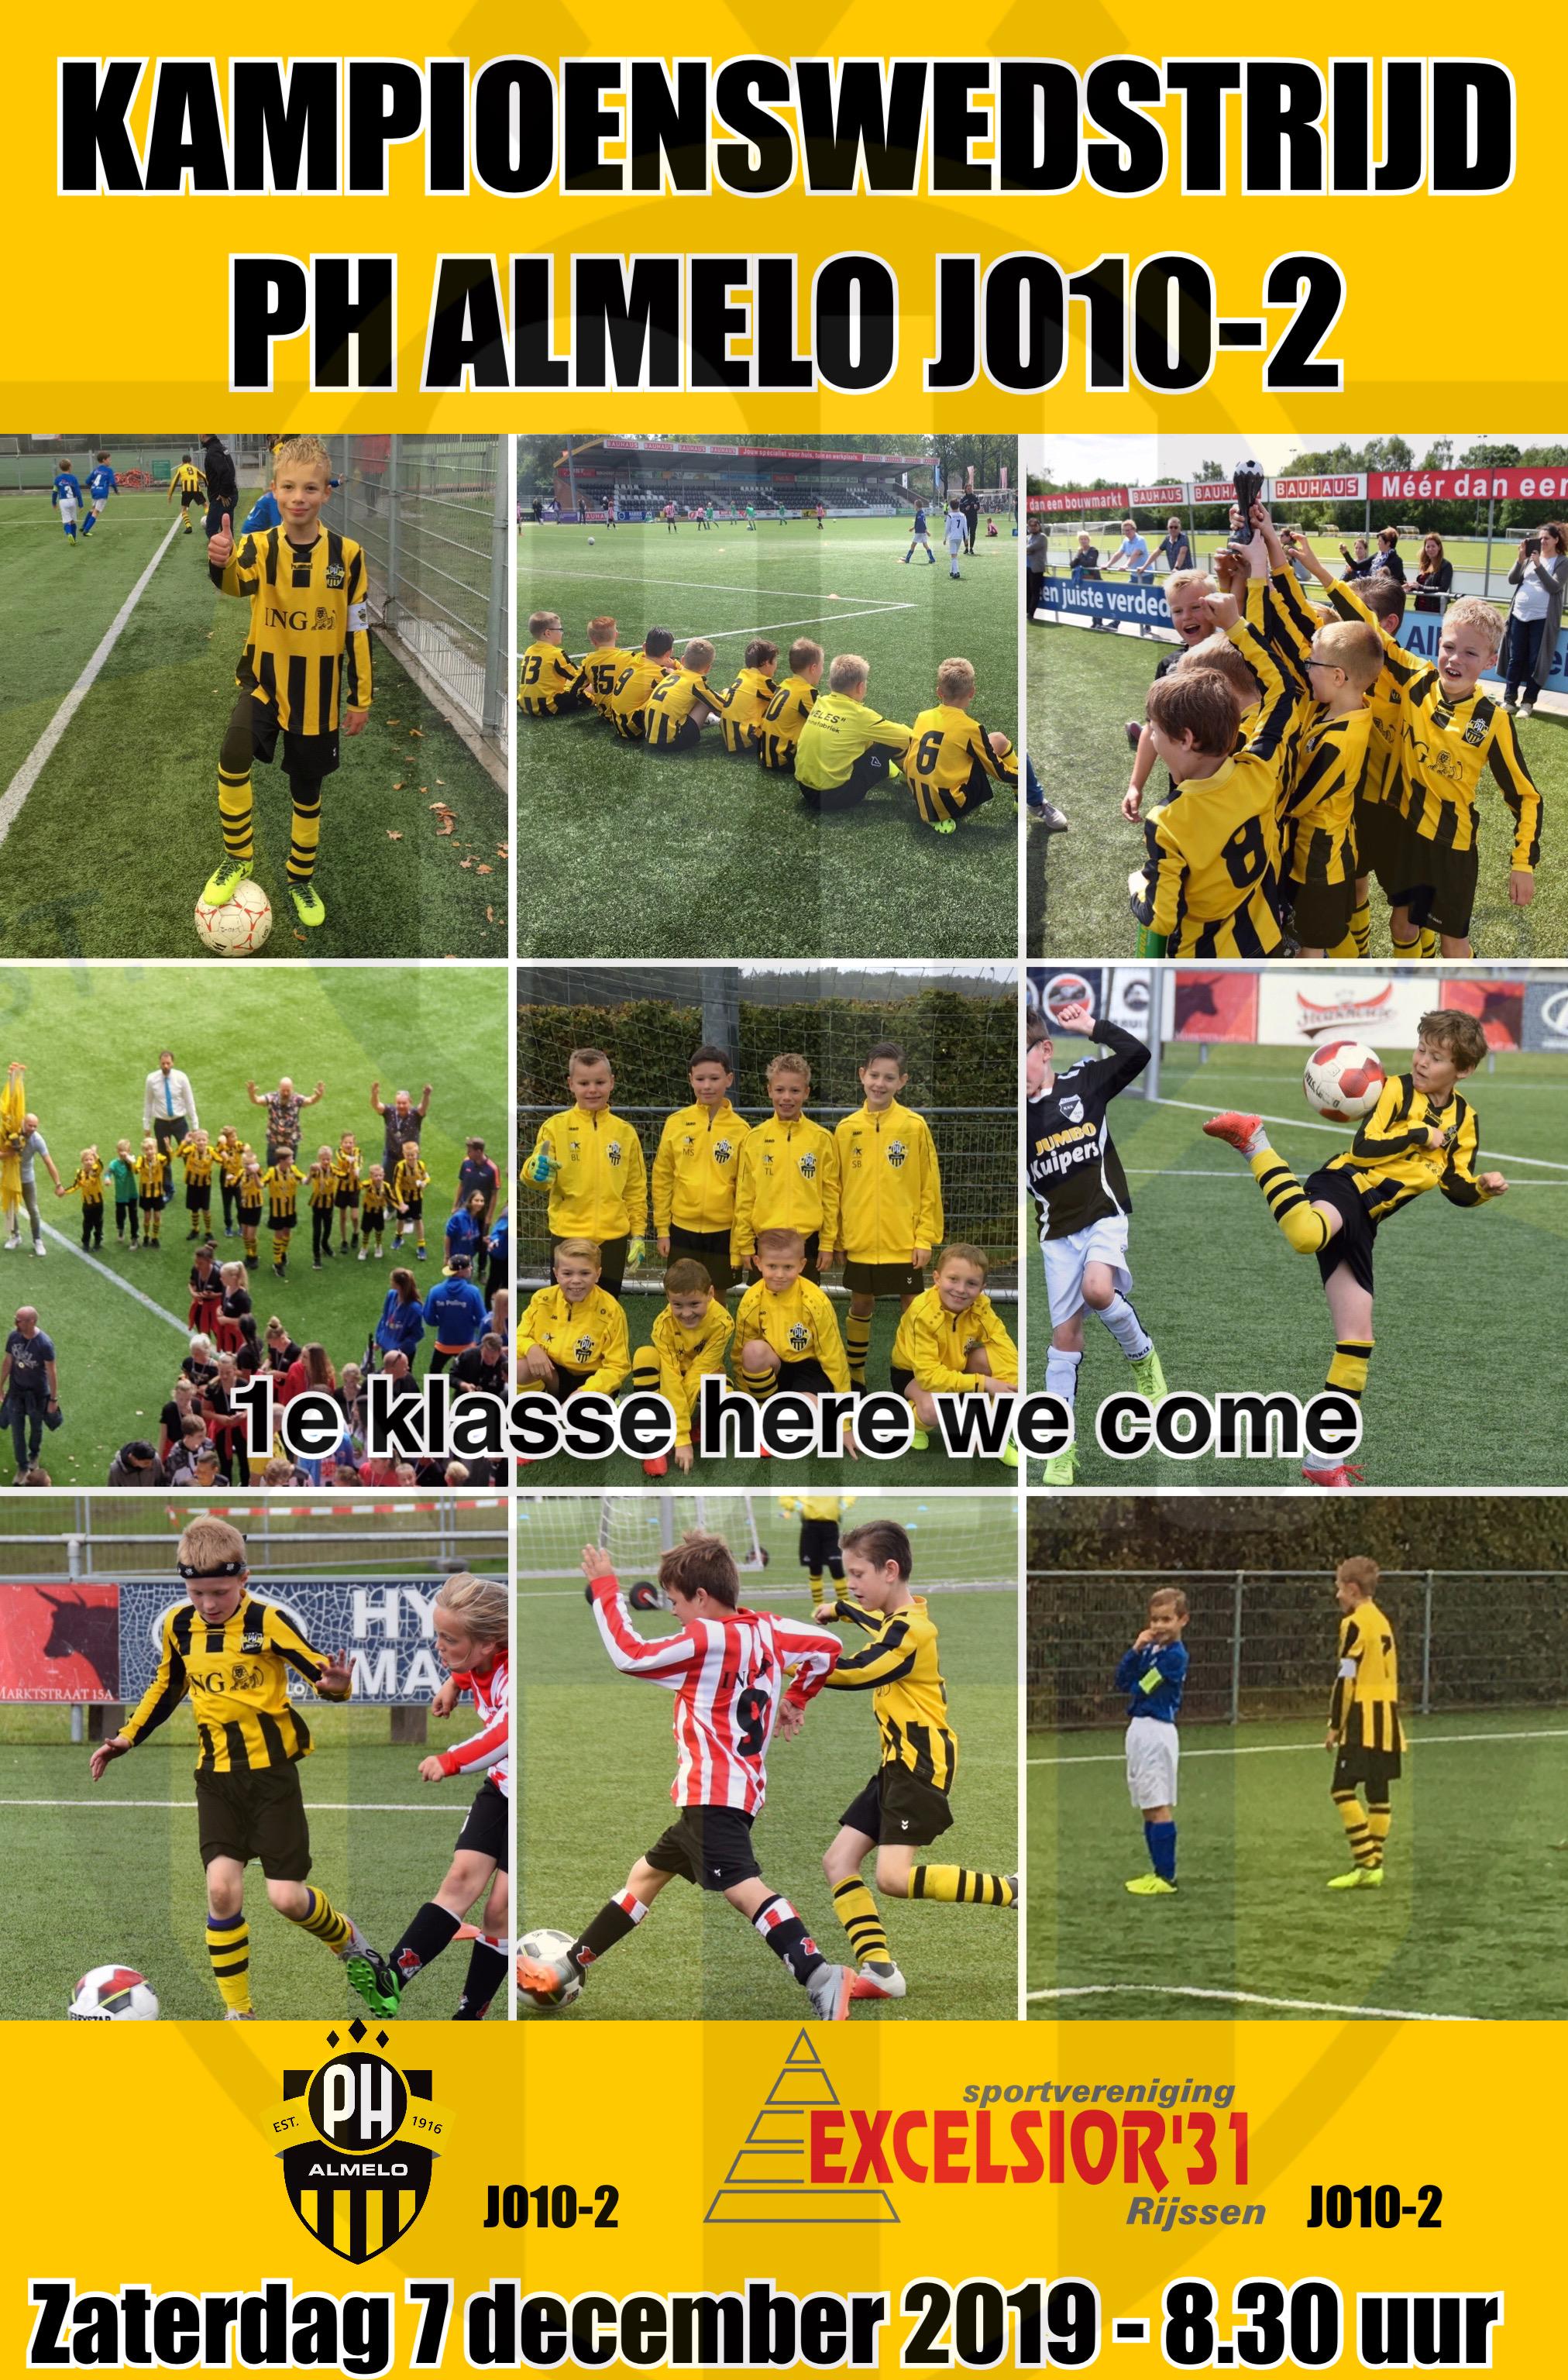 Kampioenswedstrijd PH Almelo JO10-2